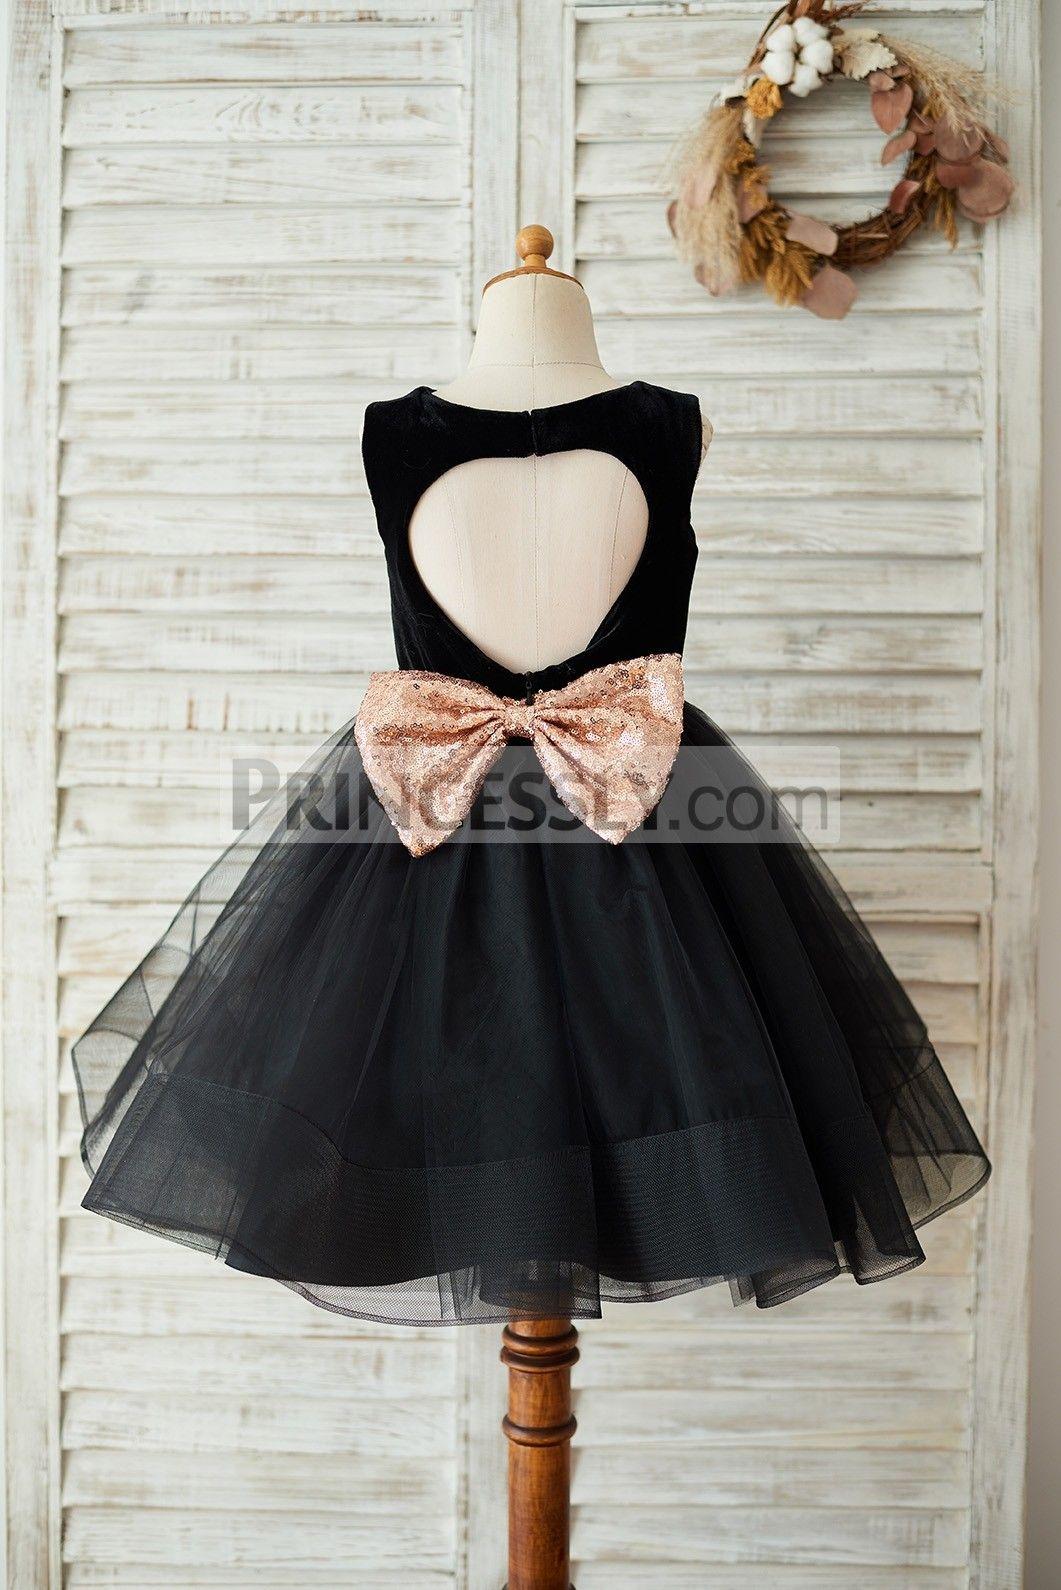 84a01f2adce Black Velvet Tulle Keyhole Back Wedding Flower Girl Dress with Sequin Bow